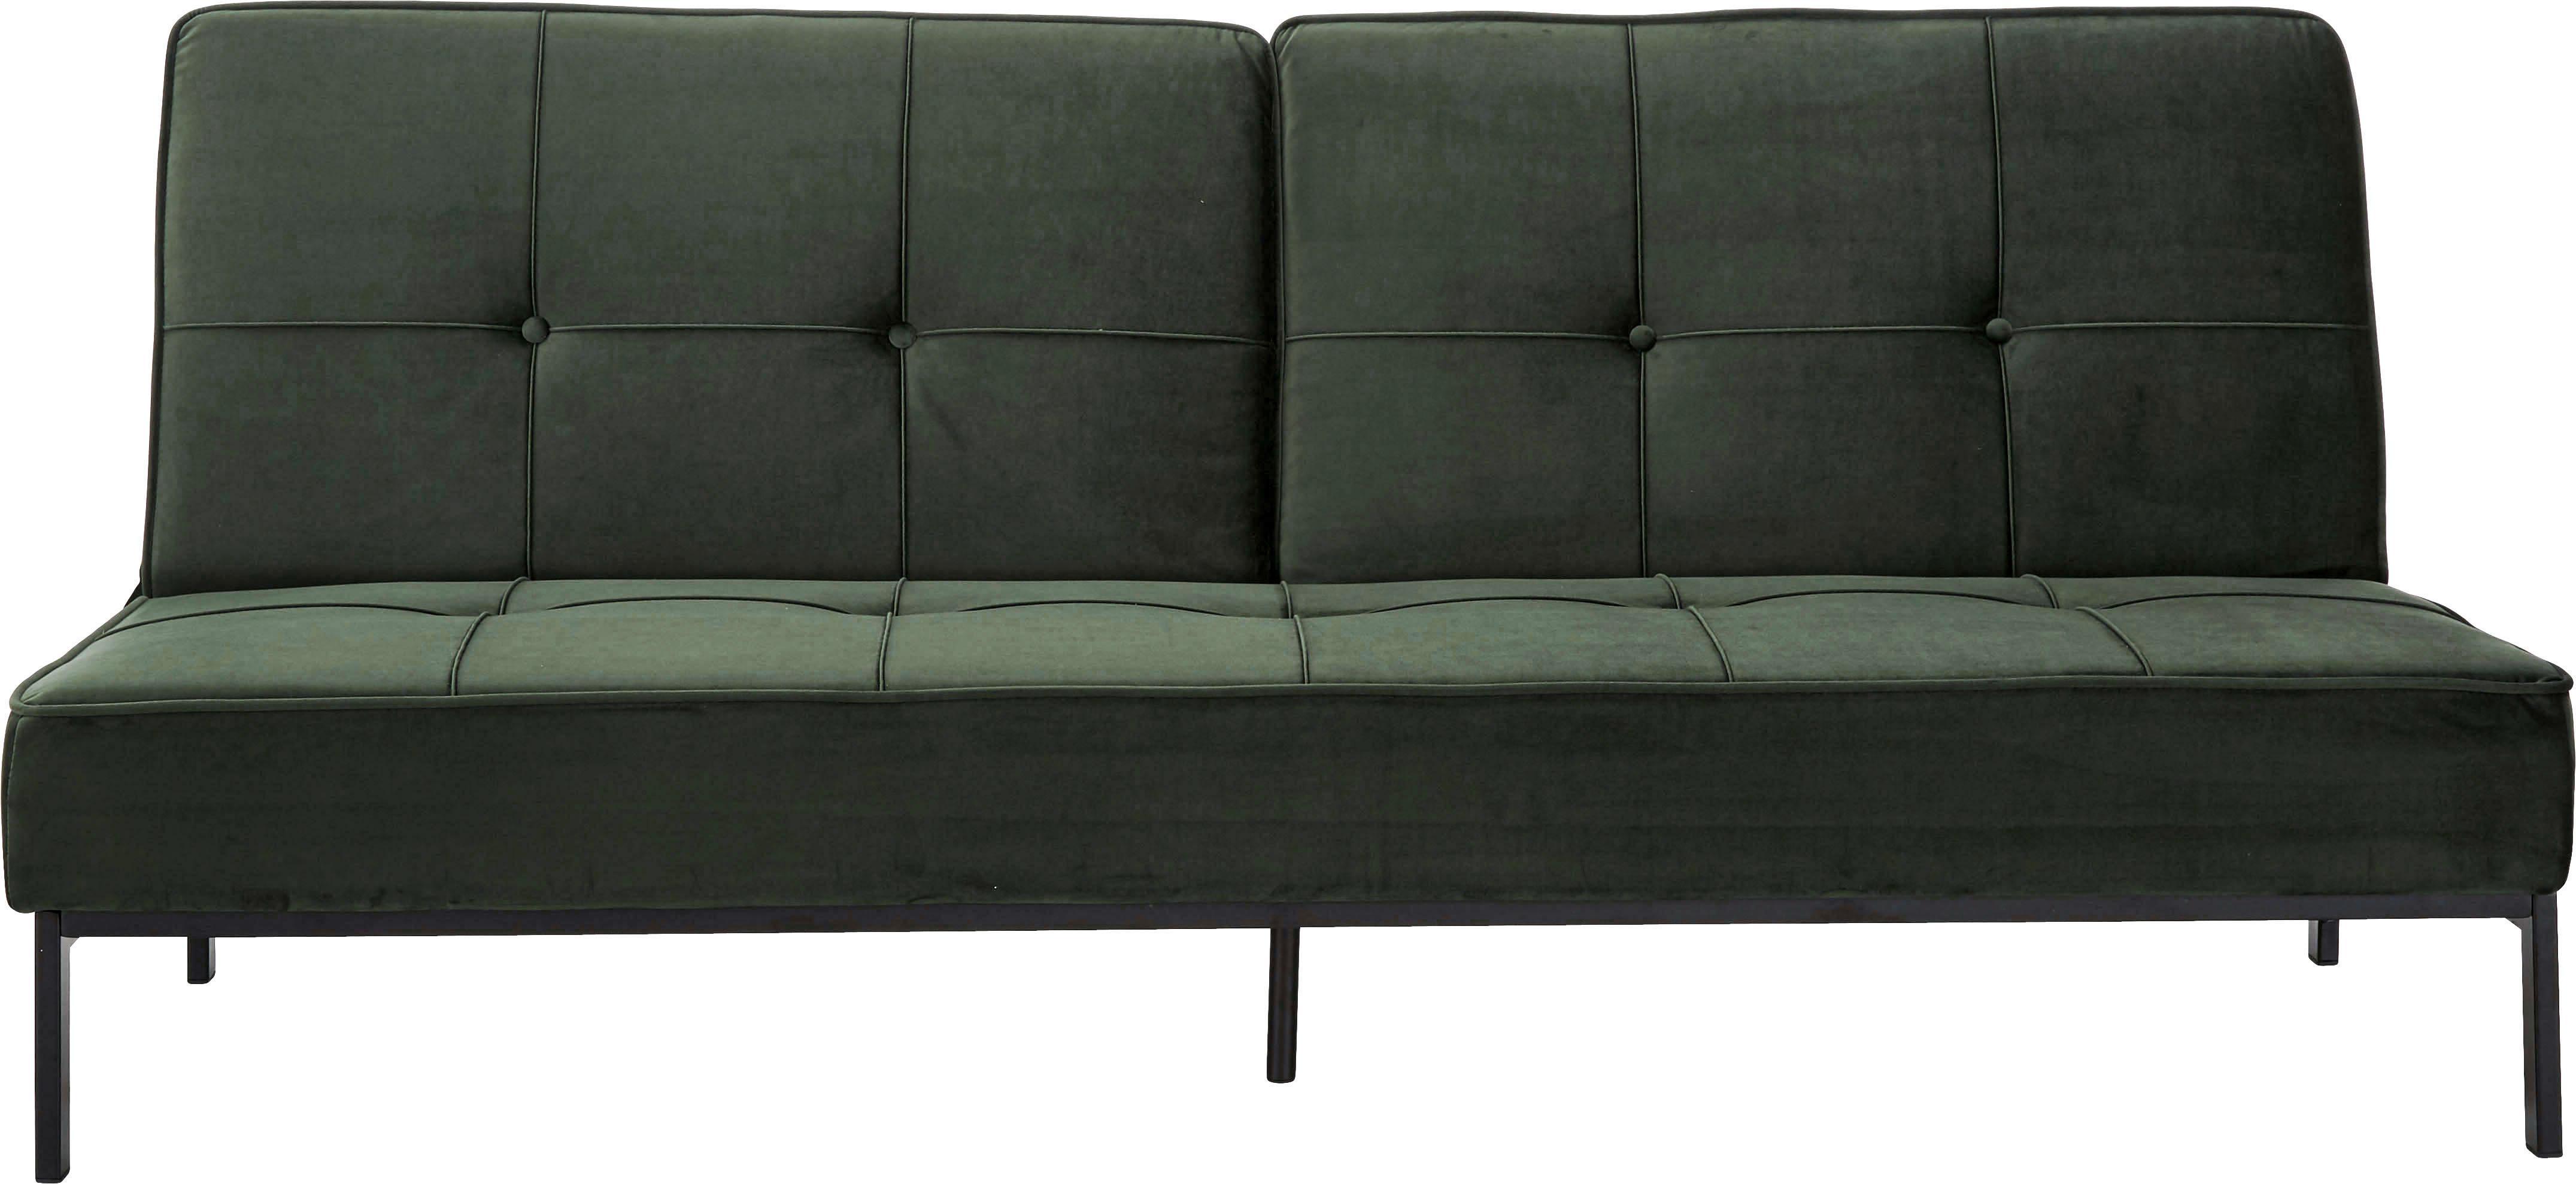 Fluwelen slaapbank Perugia (3-zits), Bekleding: polyester fluweel, Groen, B 198 x D 95 cm